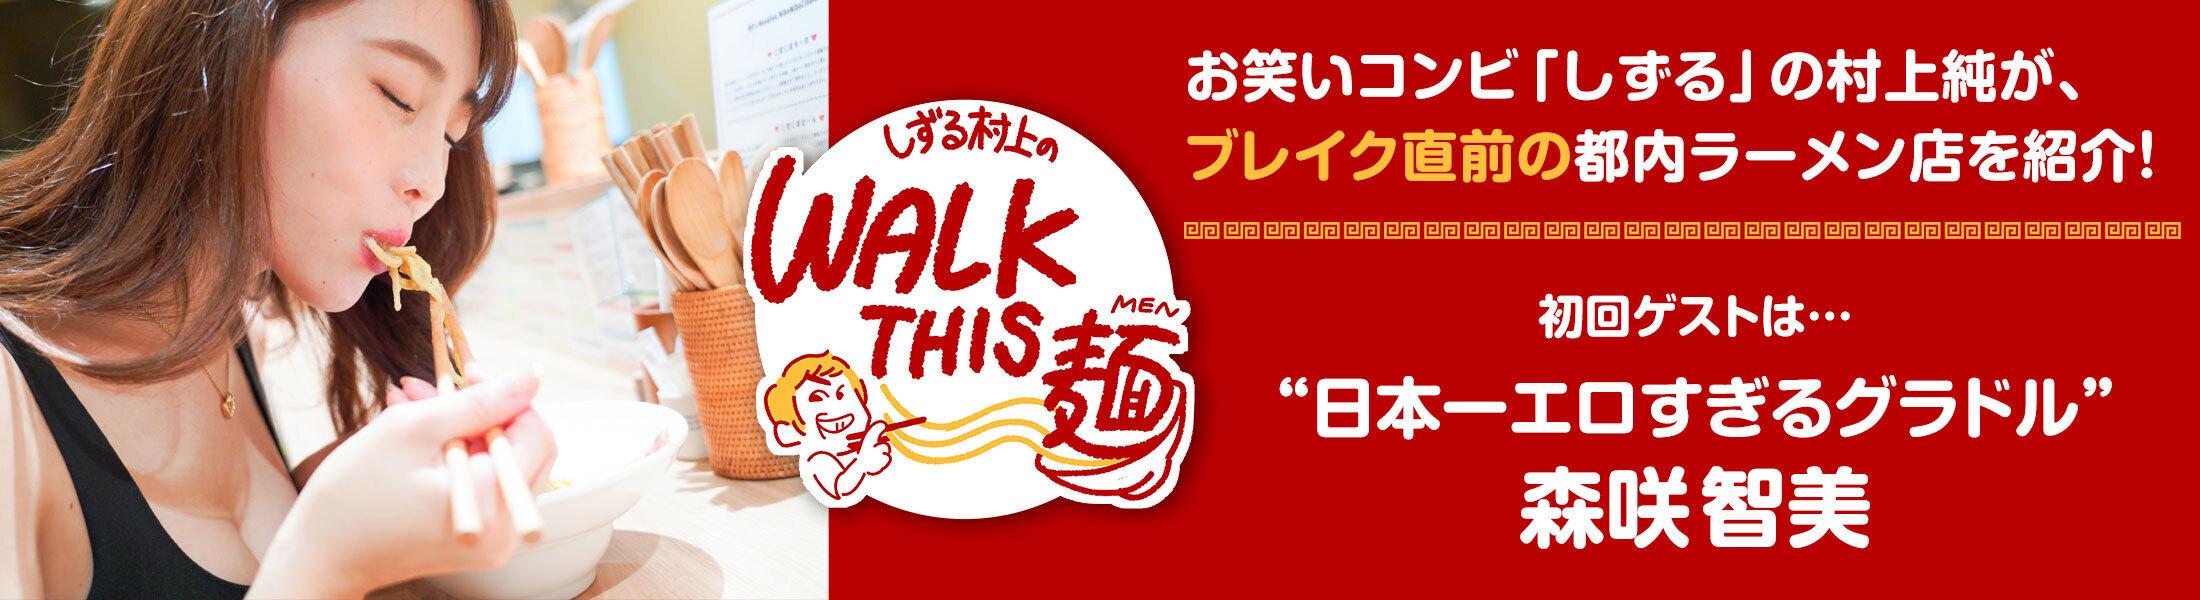 walk this 麺